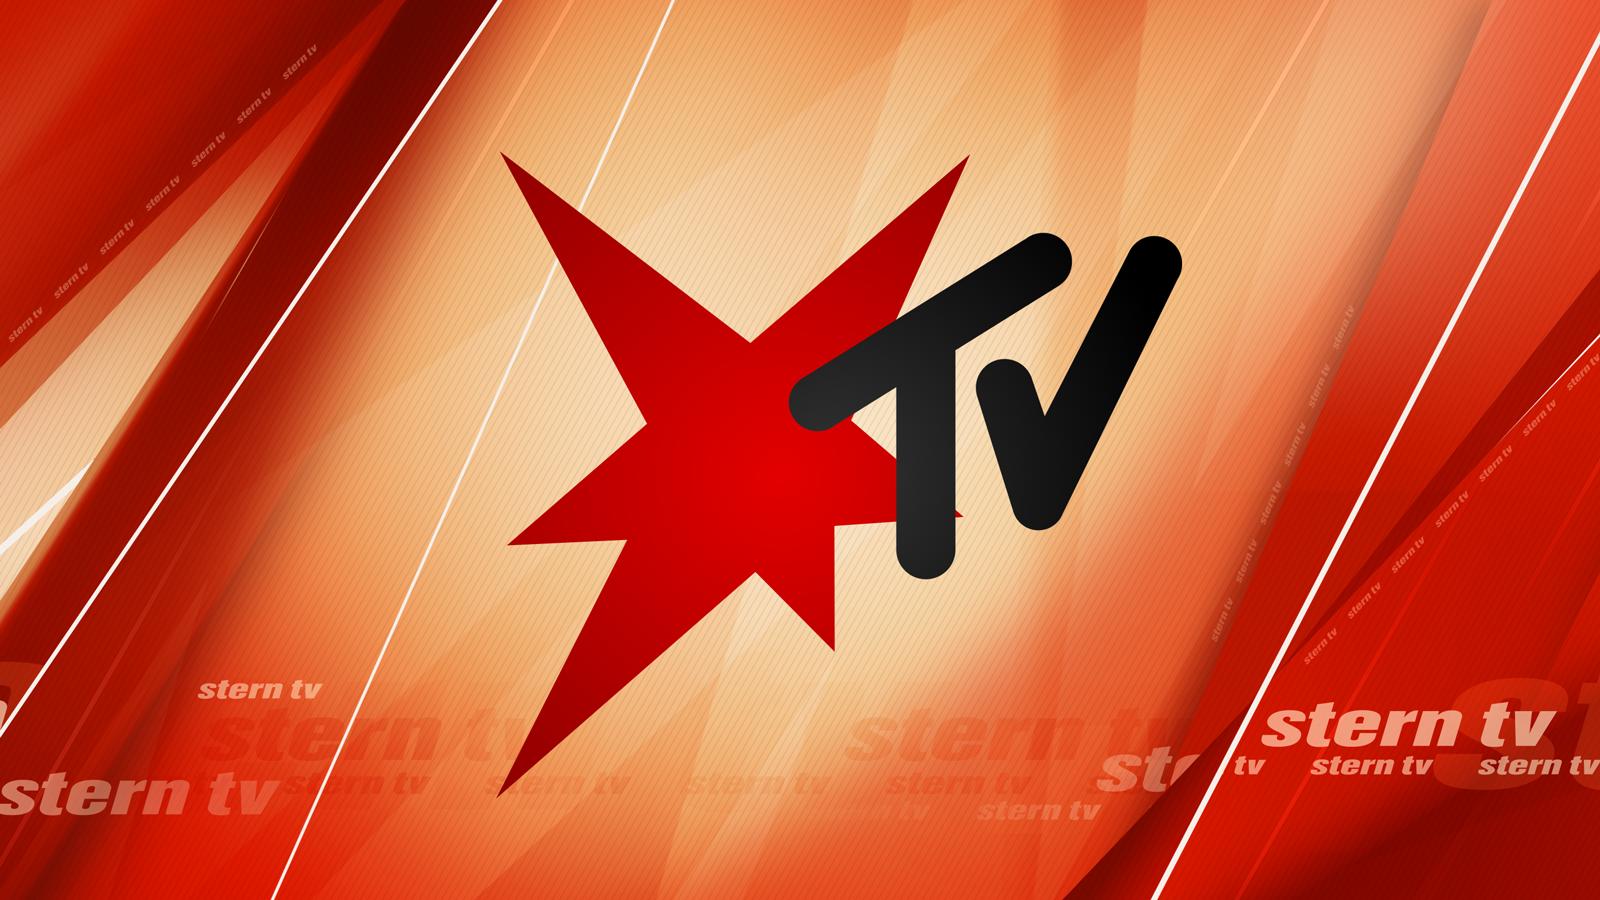 Stern TV Simon Pierro